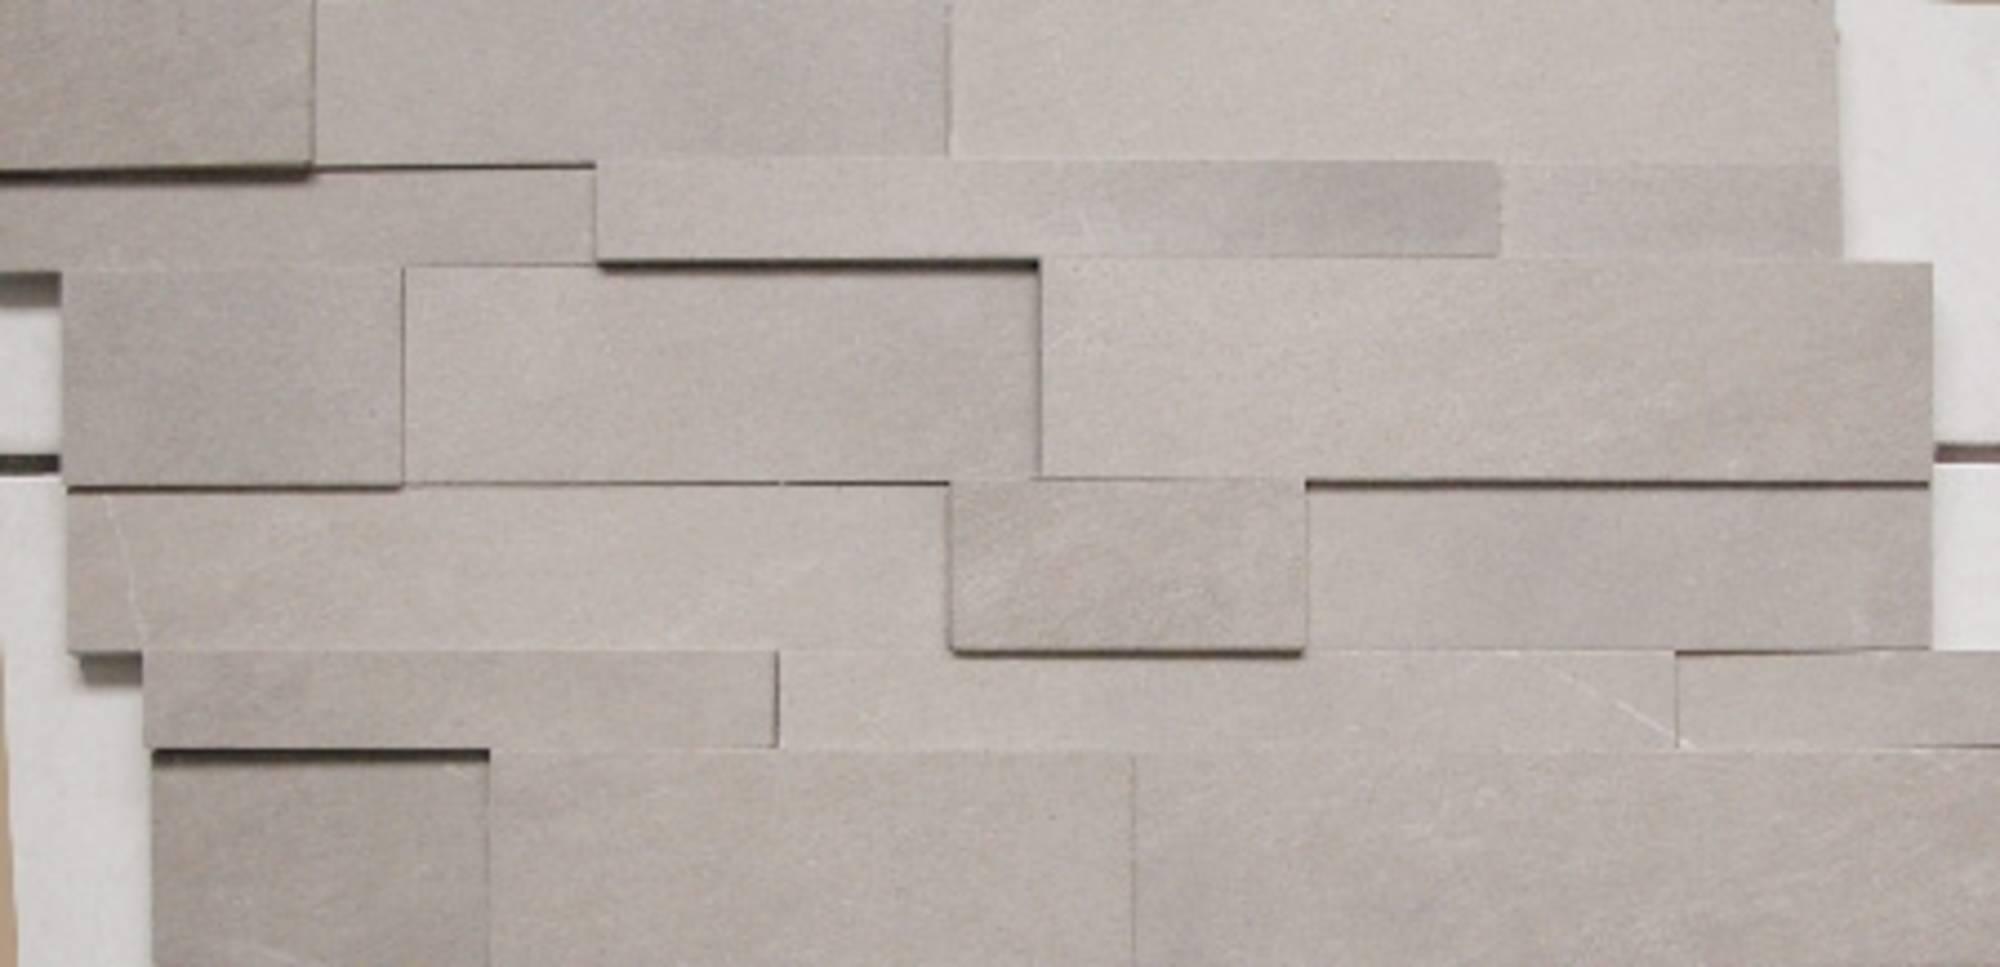 Villeroy & boch Bernina tegel decor wall 29x59 cm,